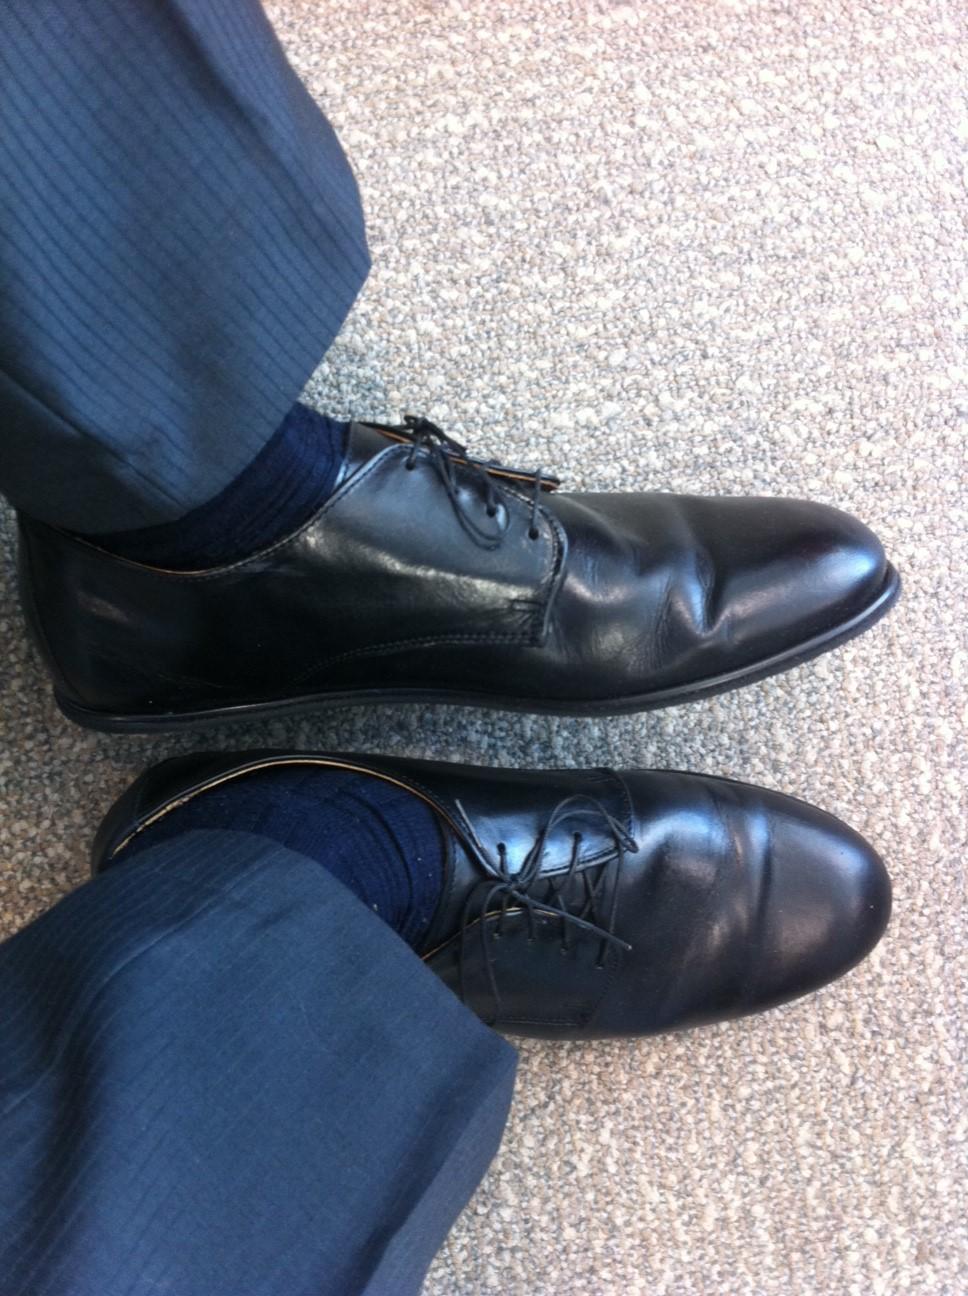 Altum Dress Shoes